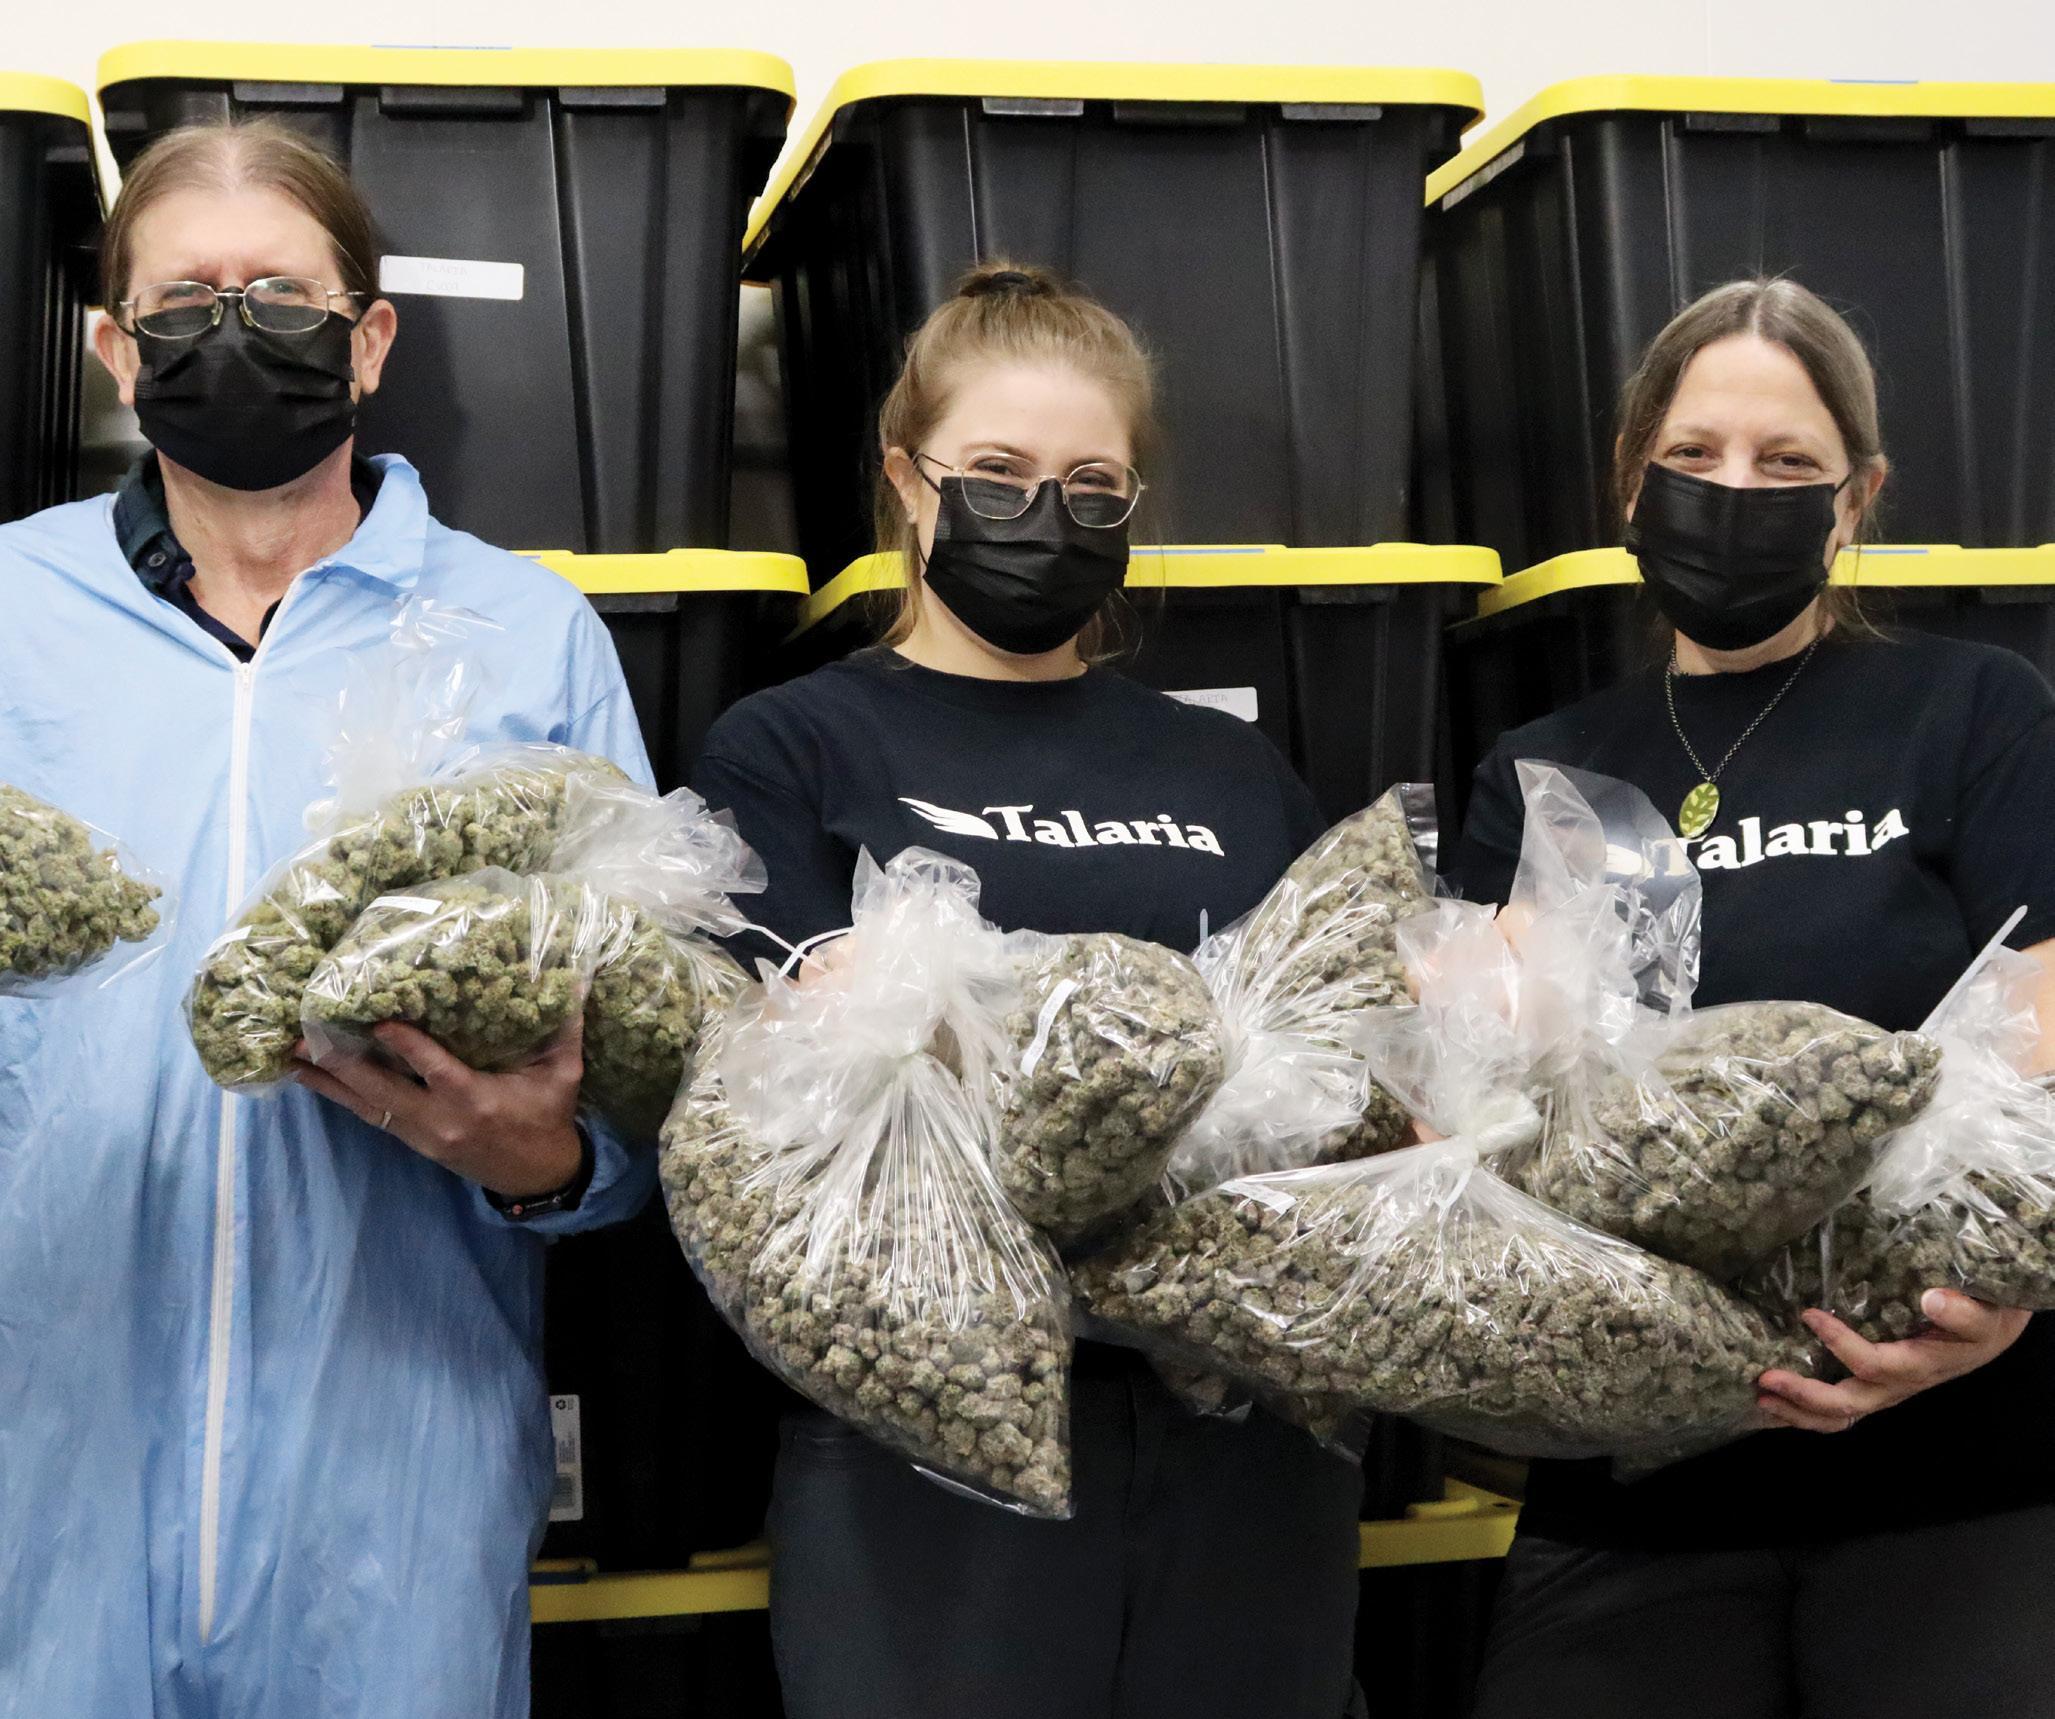 Talaria Co. Family-Run Grow Farm Rhode Island